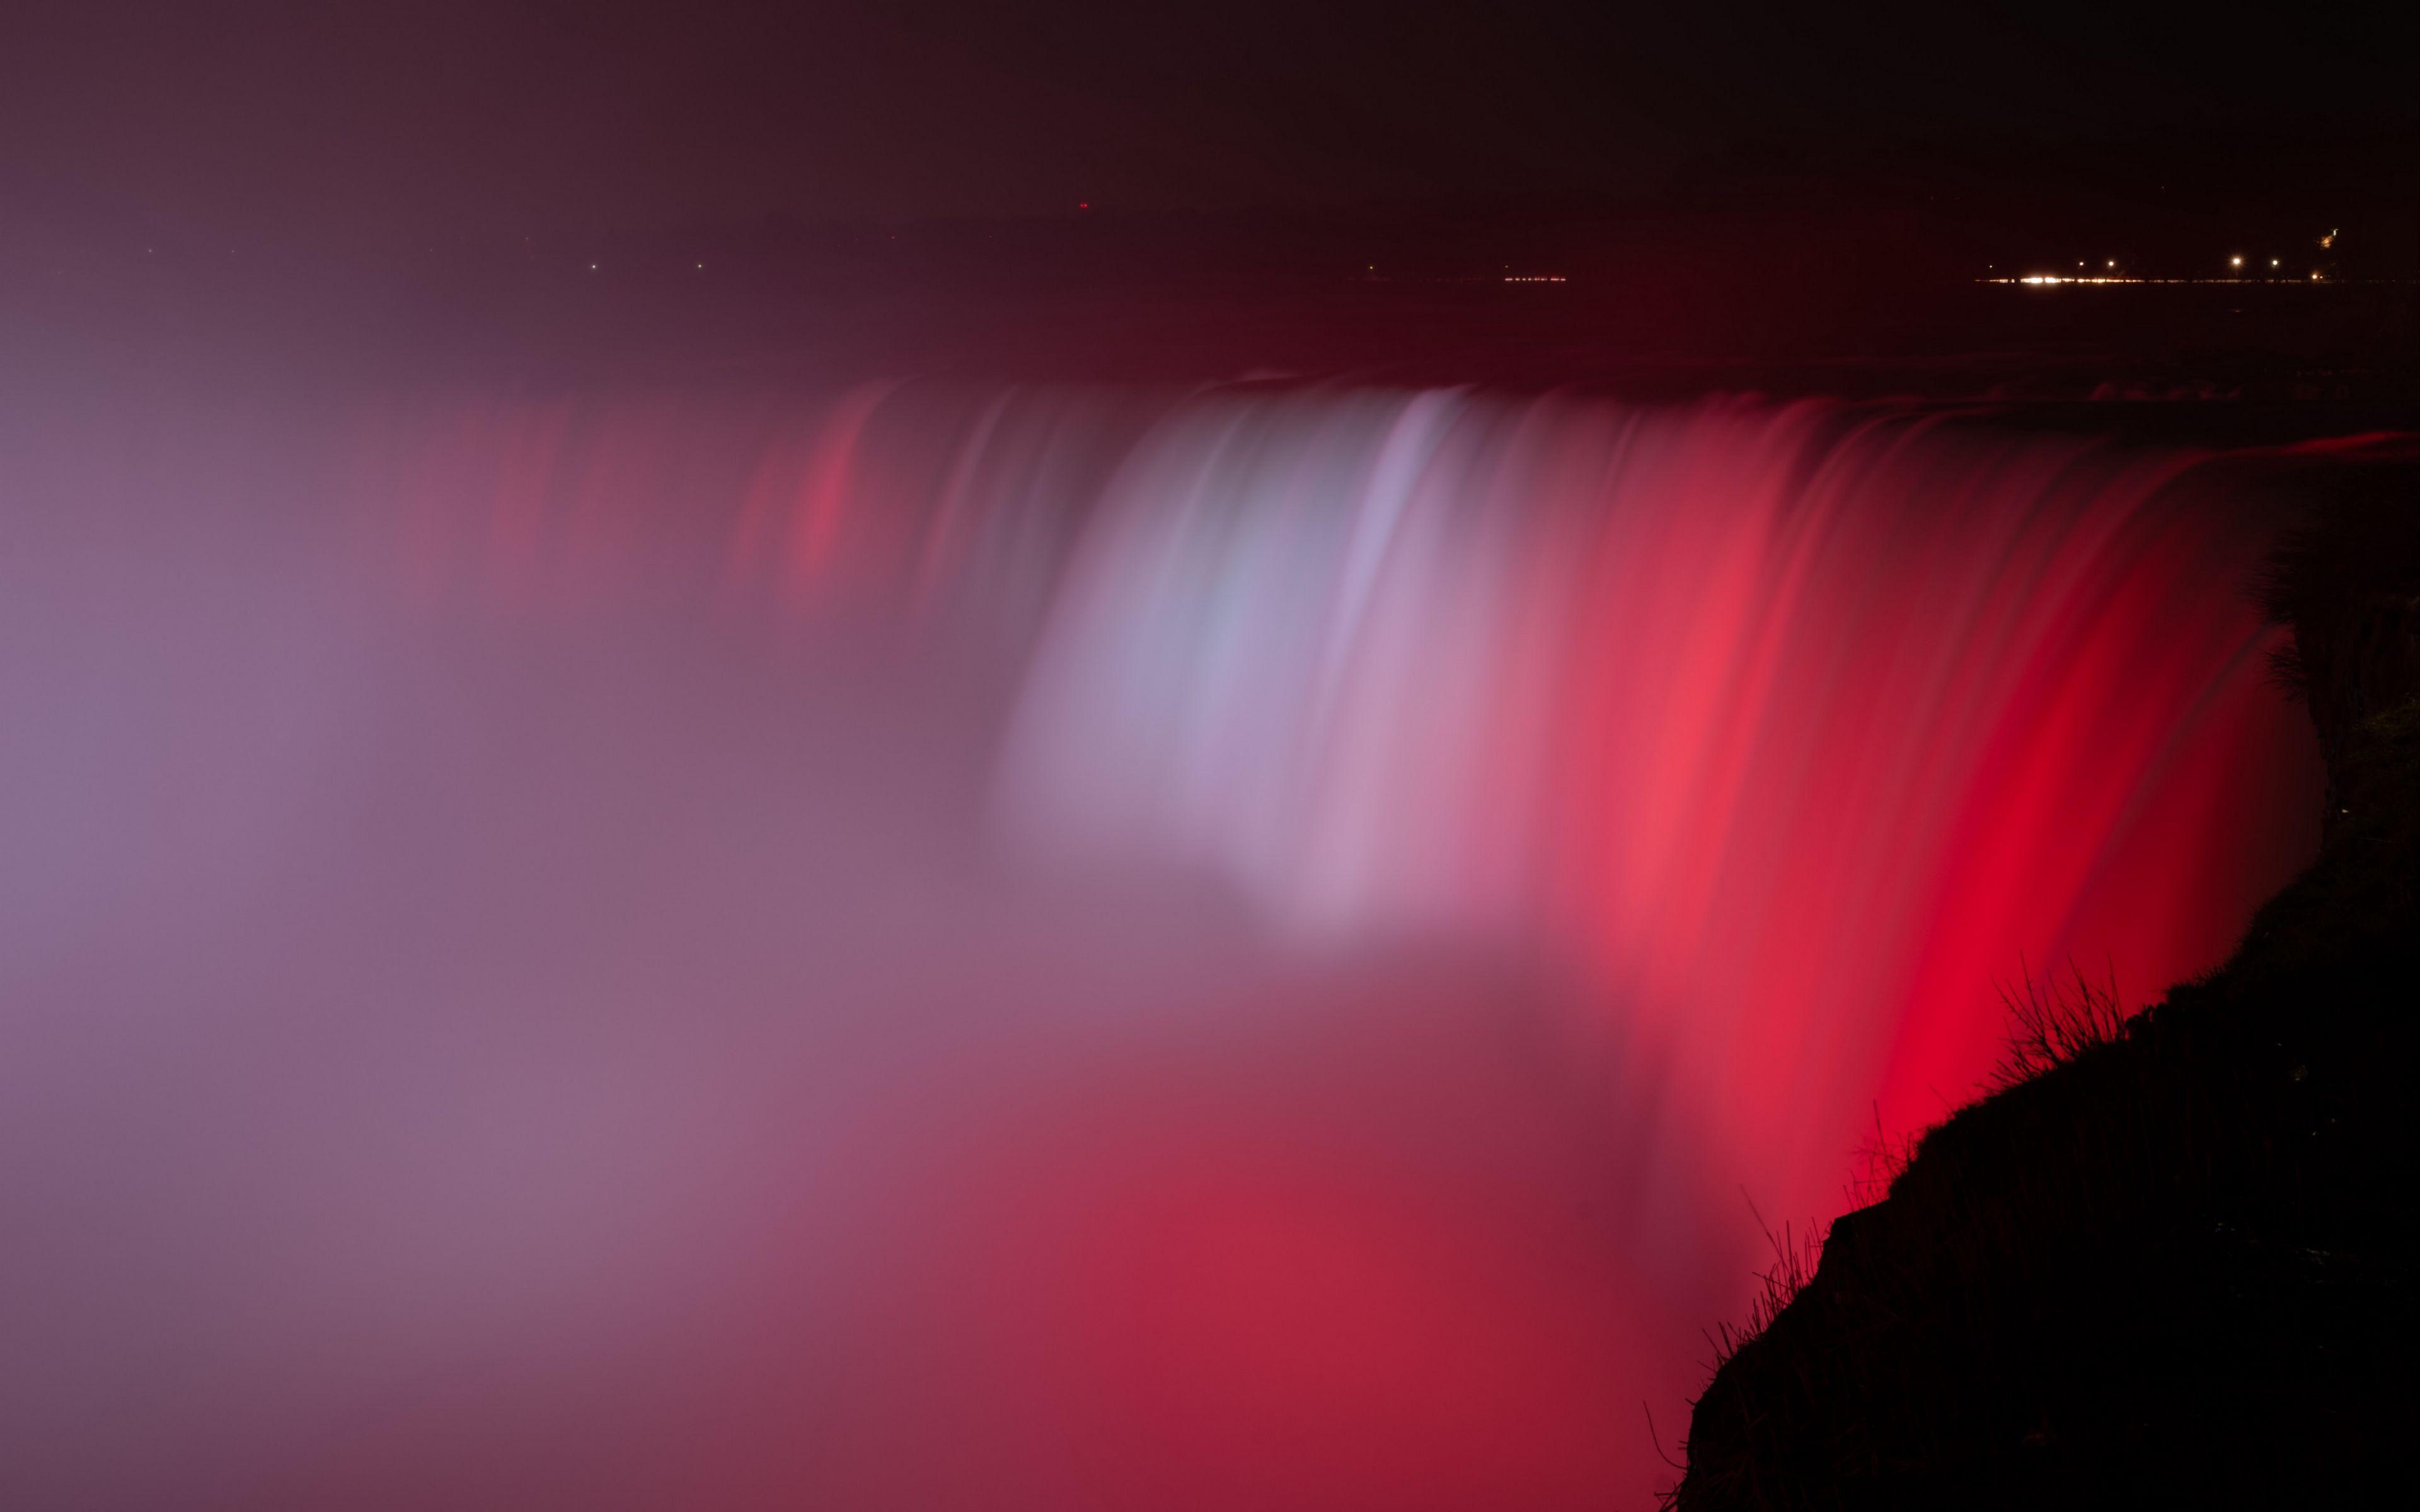 3840x2400 Wallpaper waterfall, fog, backlight, red, dark